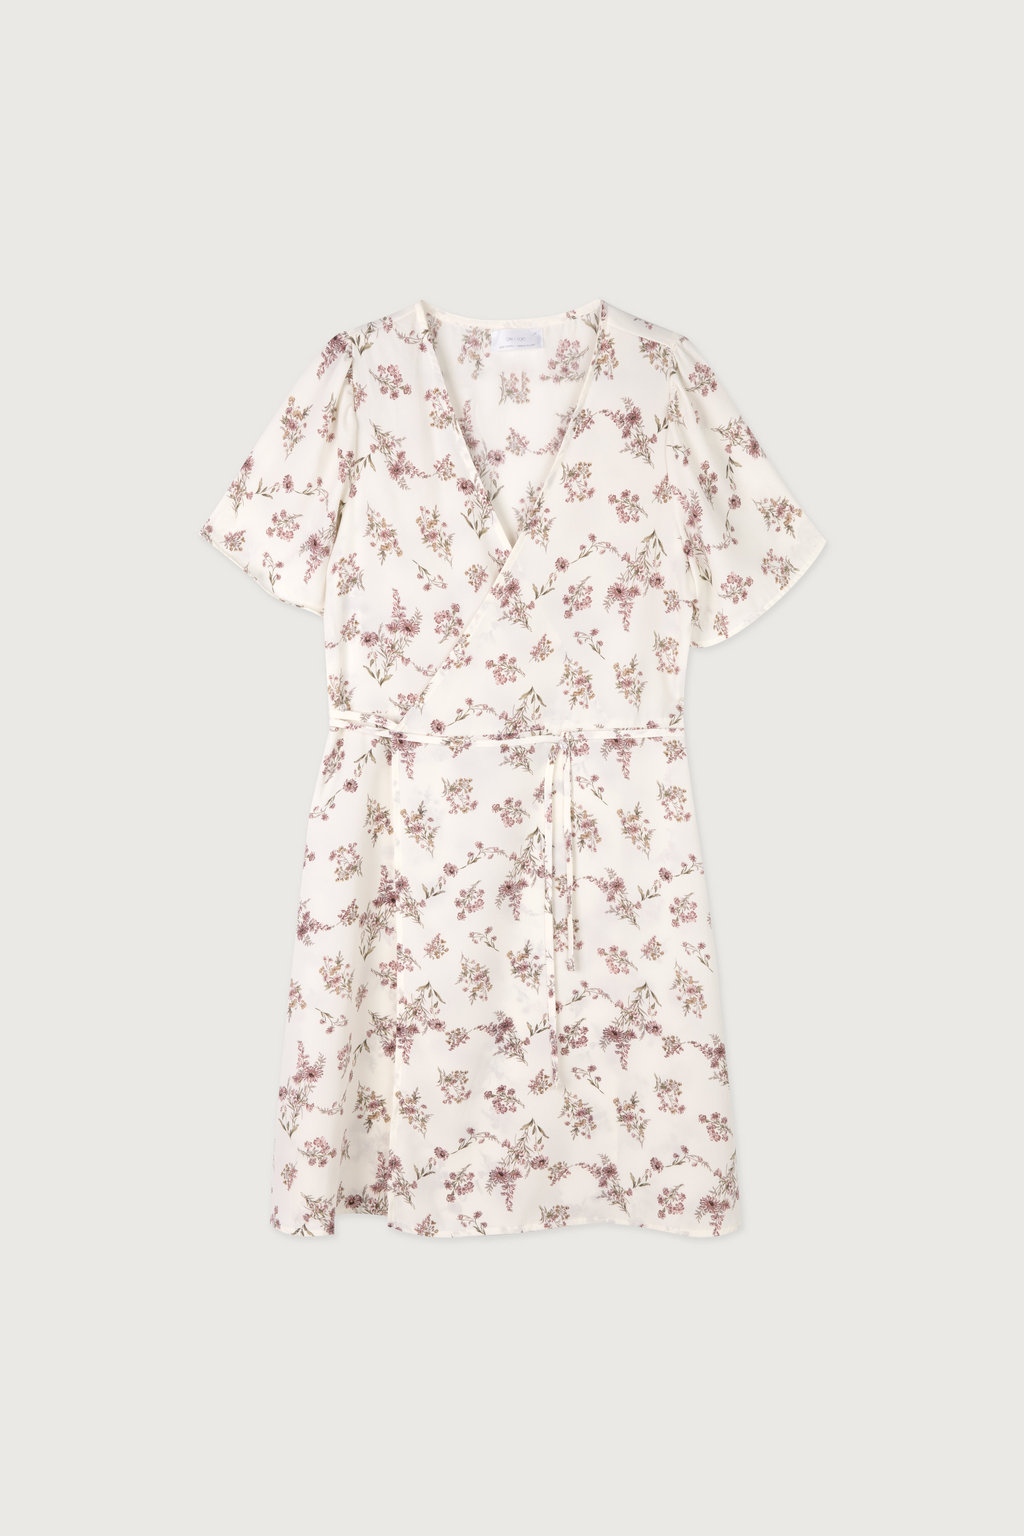 Dress K006 Cream 5